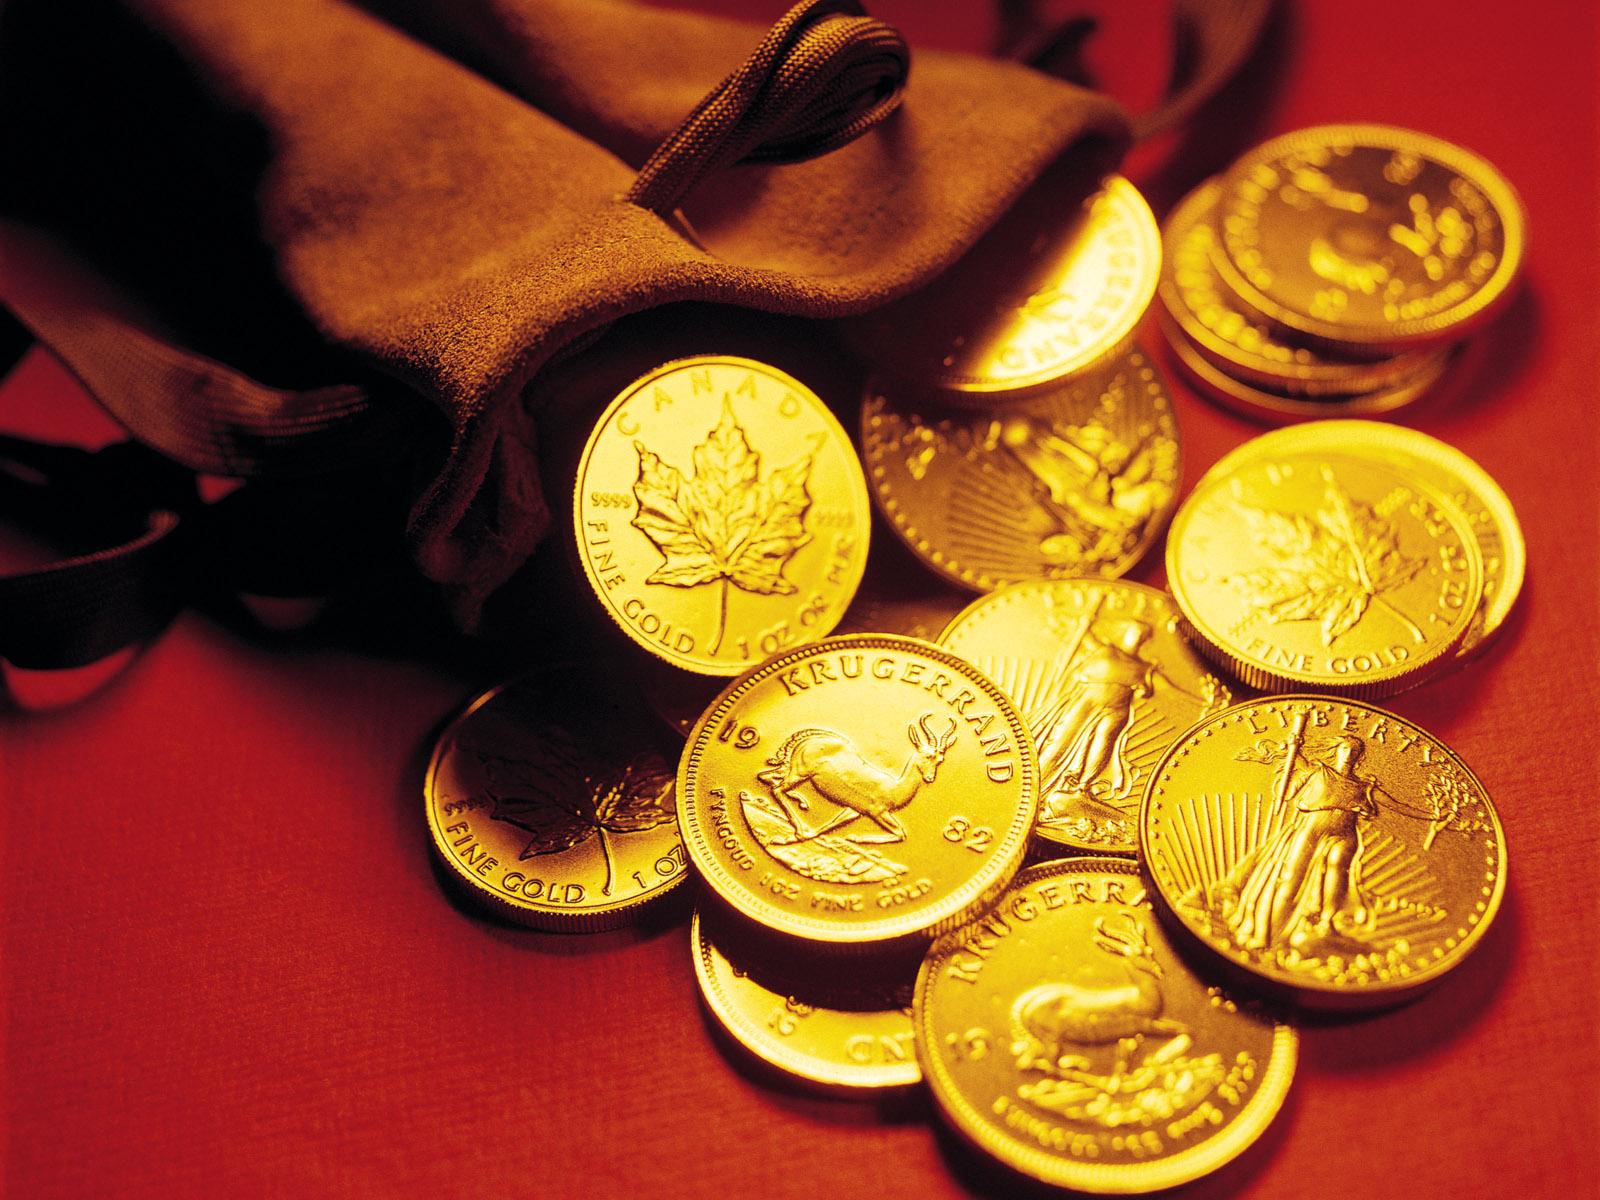 landis refining, dental industry, scrap metal, purchase gold, purchase dental scraps